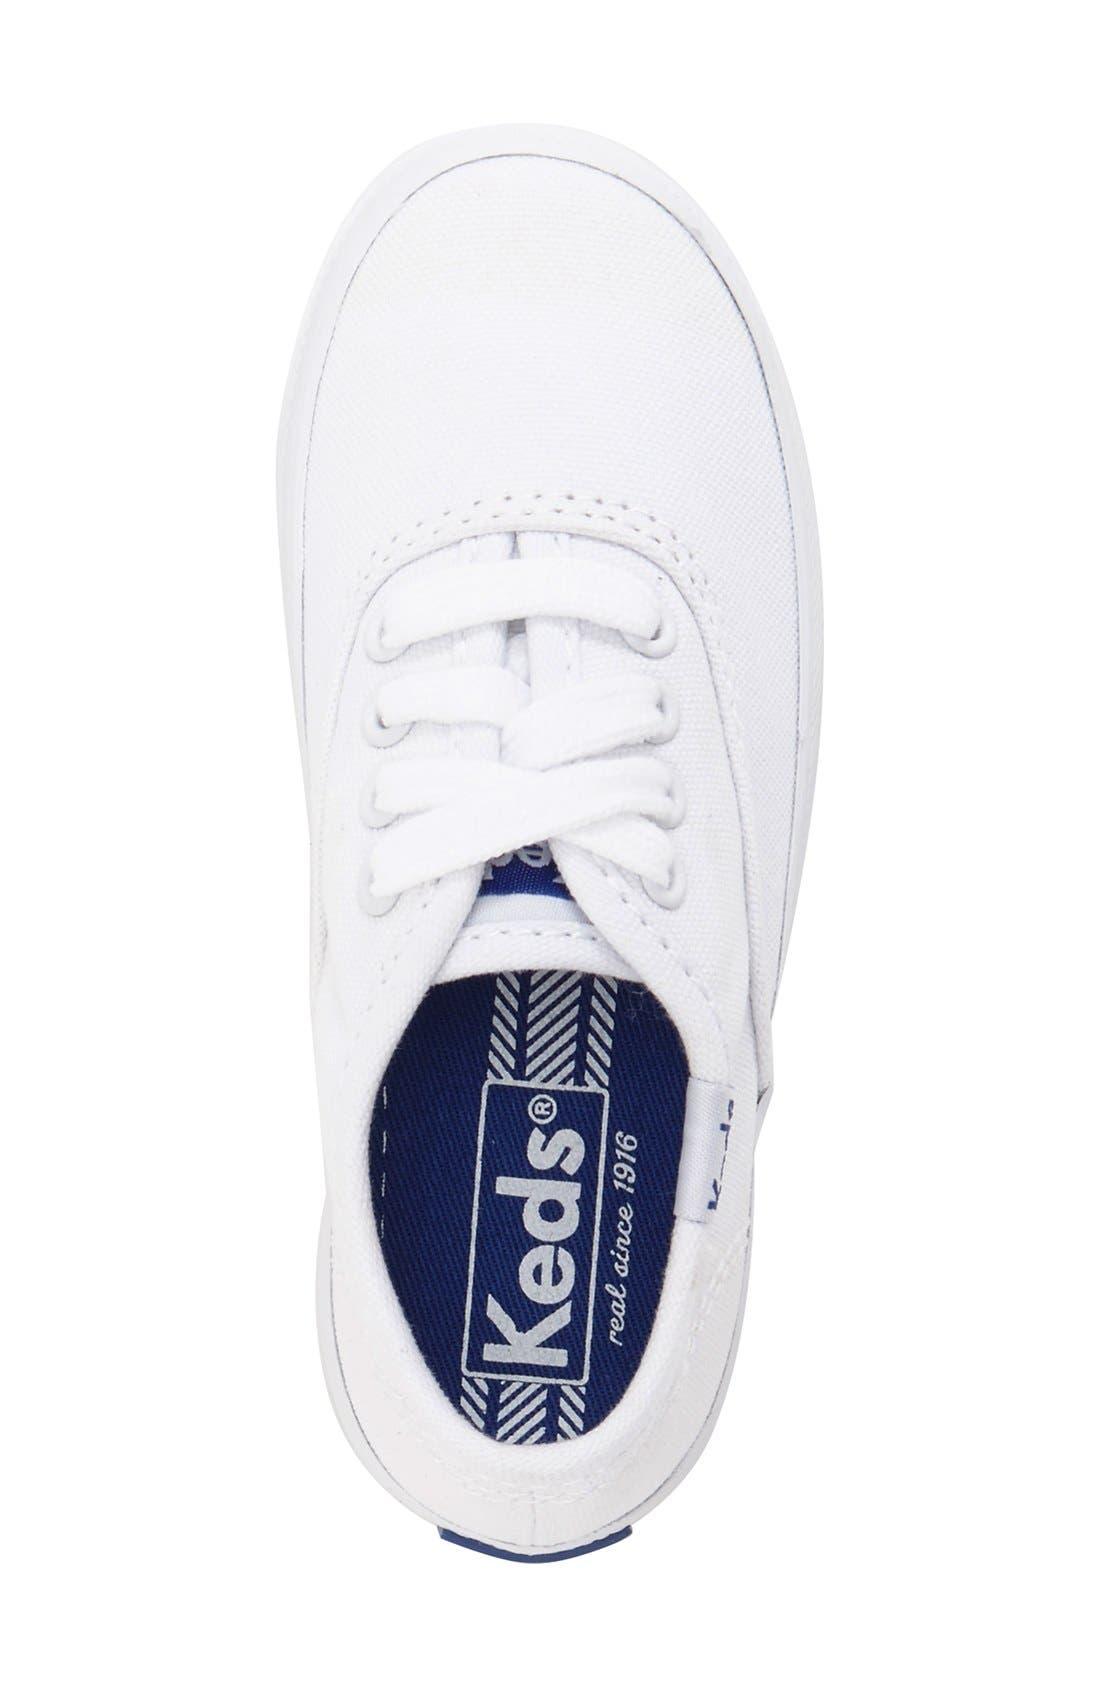 Alternate Image 3  - Keds® 'Champion Canvas' Sneaker (Walker & Toddler)